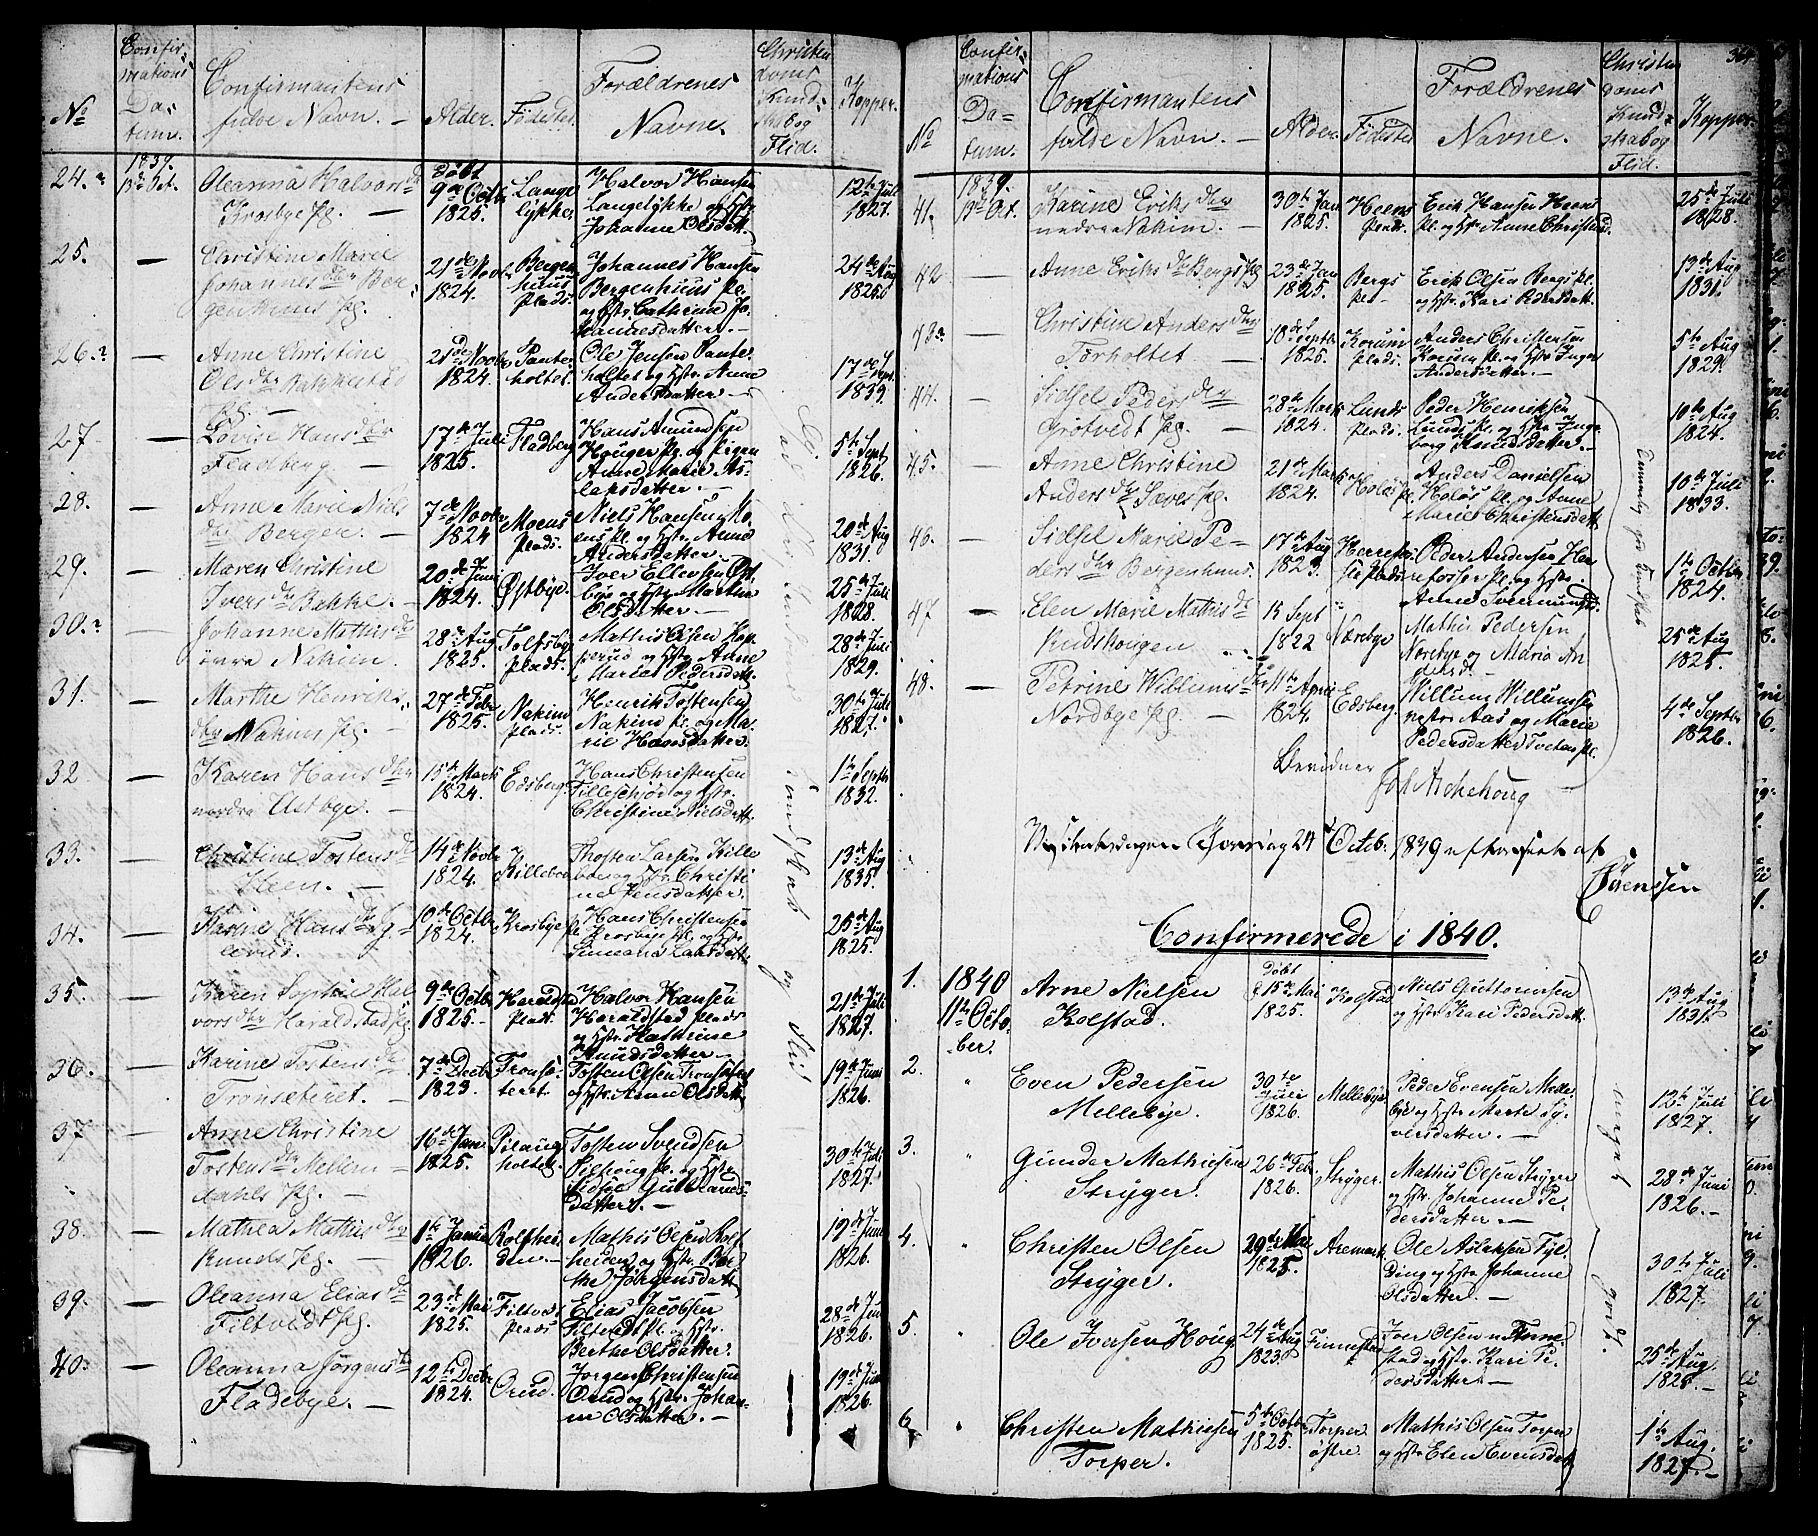 SAO, Rakkestad prestekontor Kirkebøker, F/Fa/L0007: Ministerialbok nr. I 7, 1825-1841, s. 364